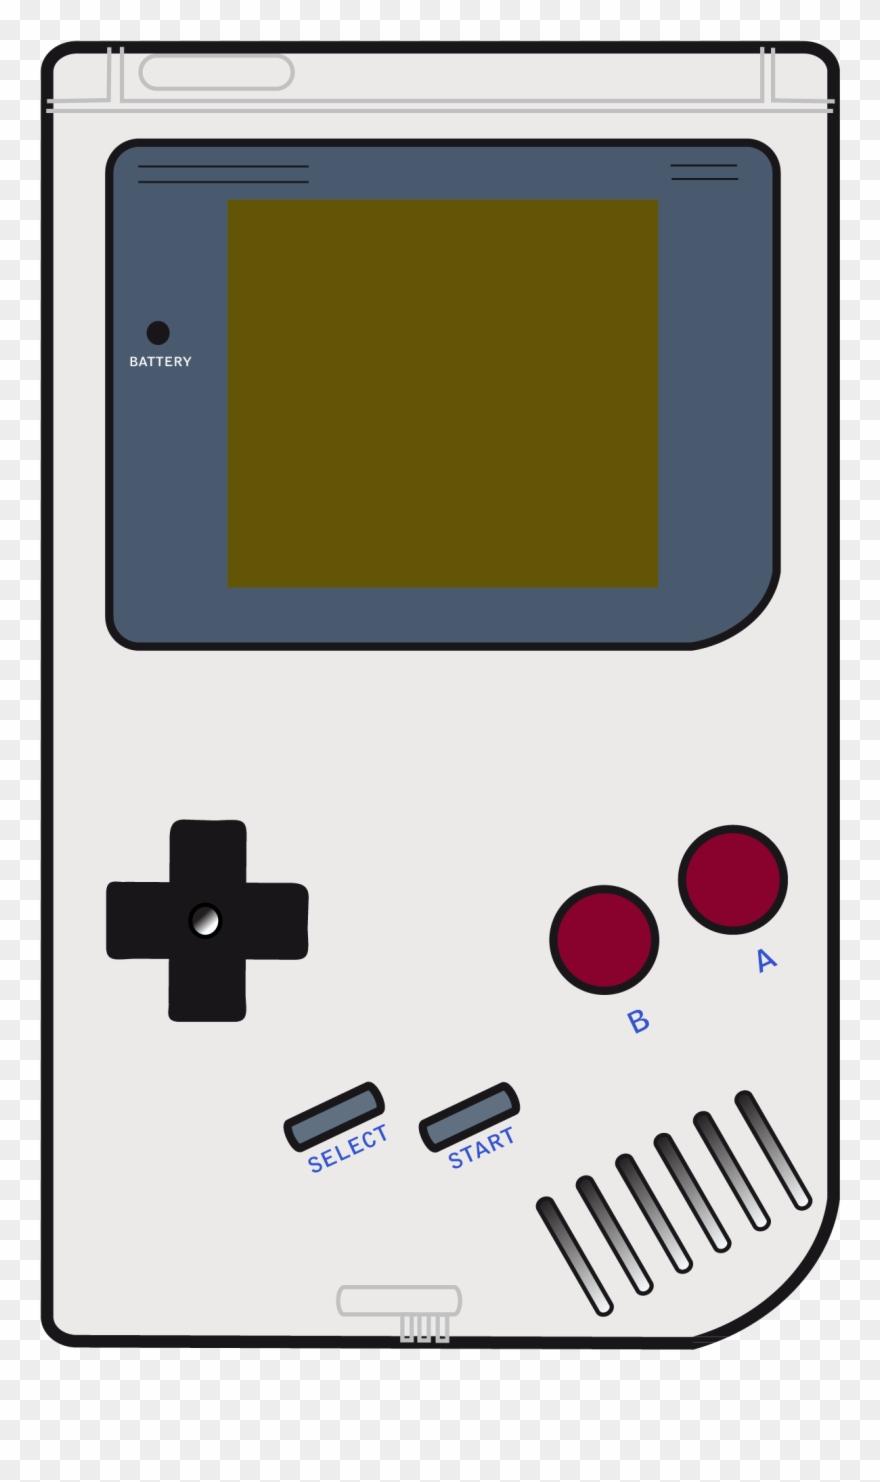 Game boy png art. Games clipart gameboy